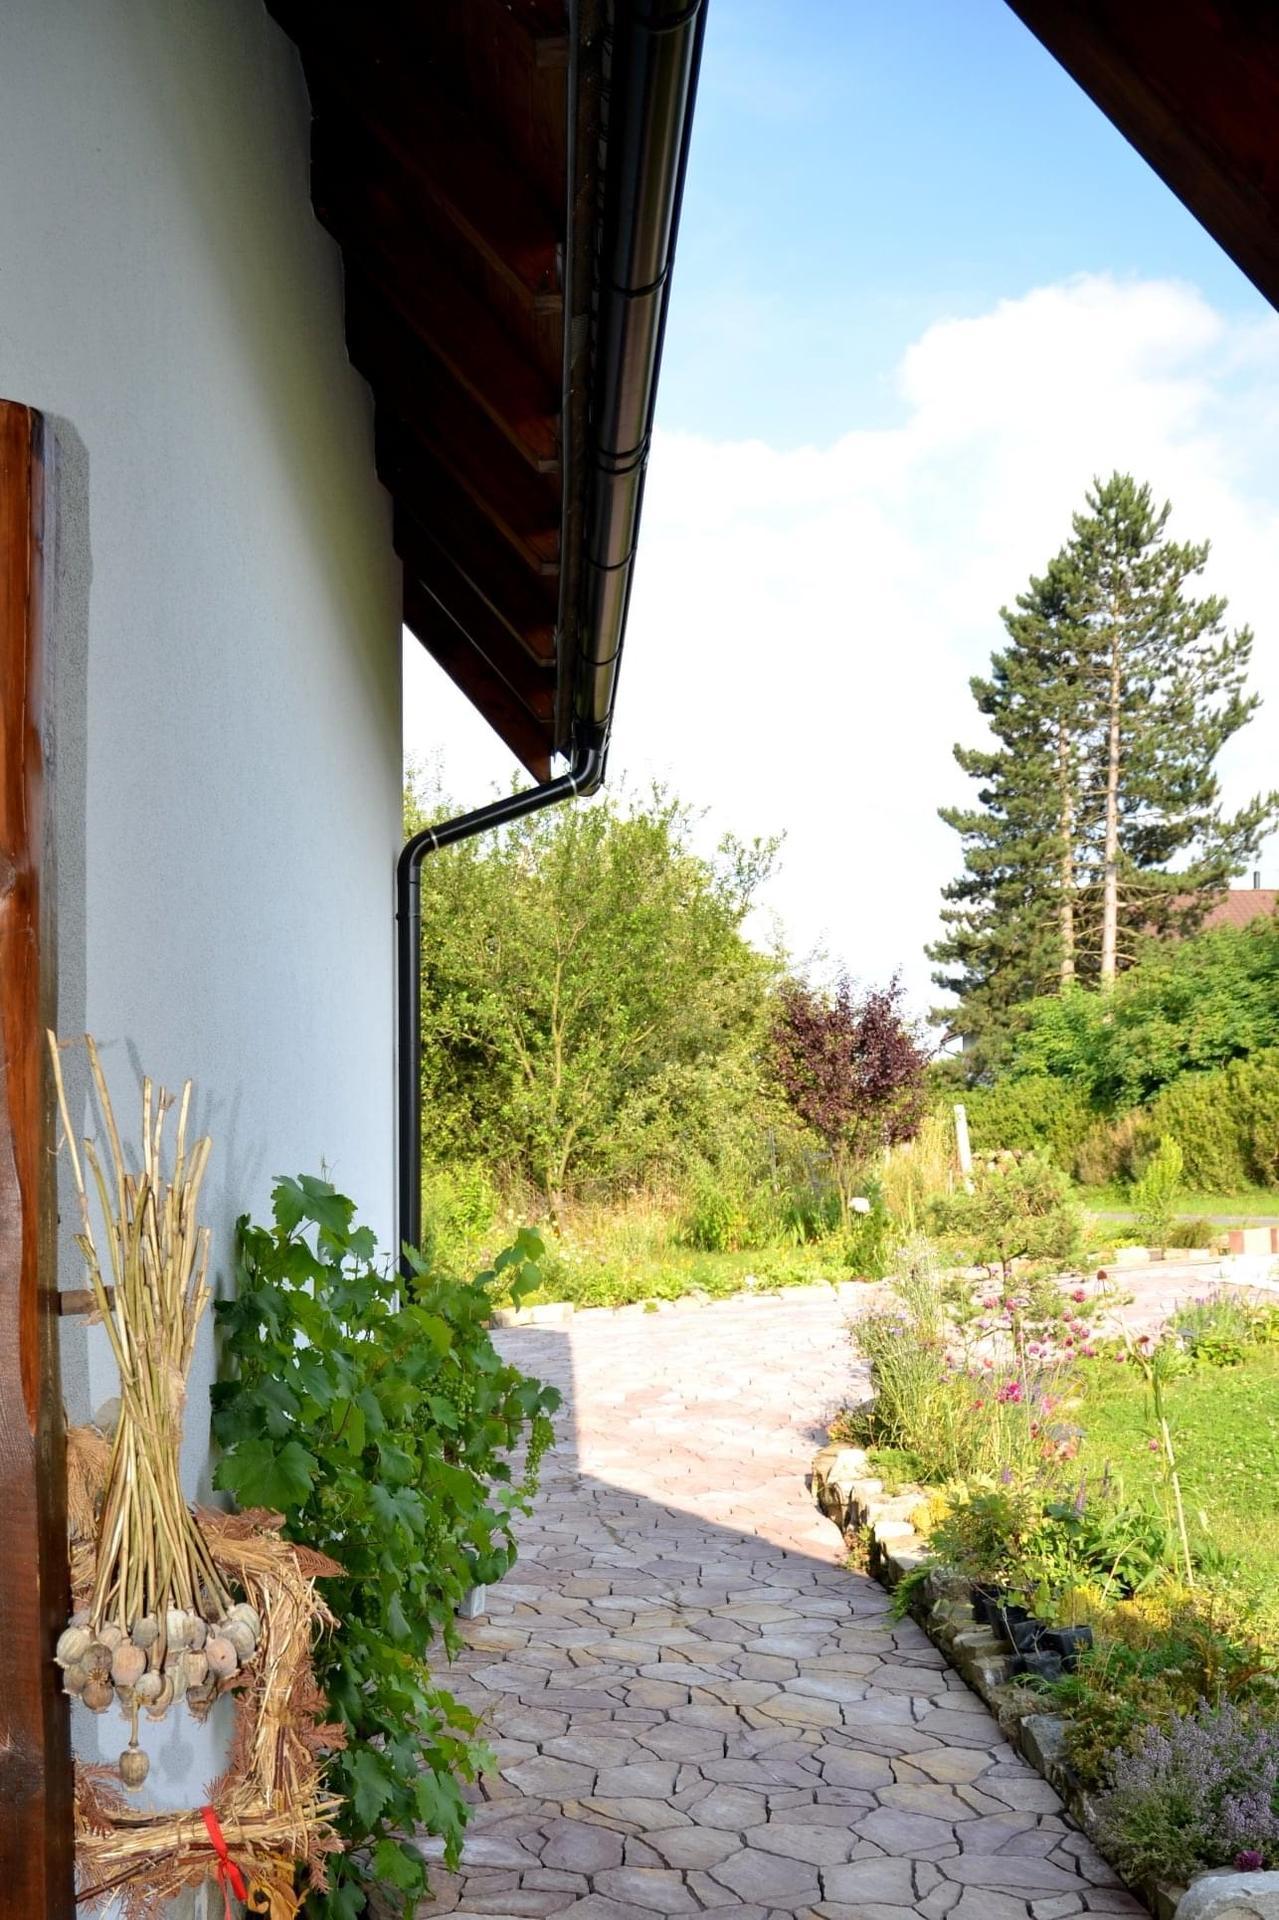 Zahrada - Obrázek č. 365